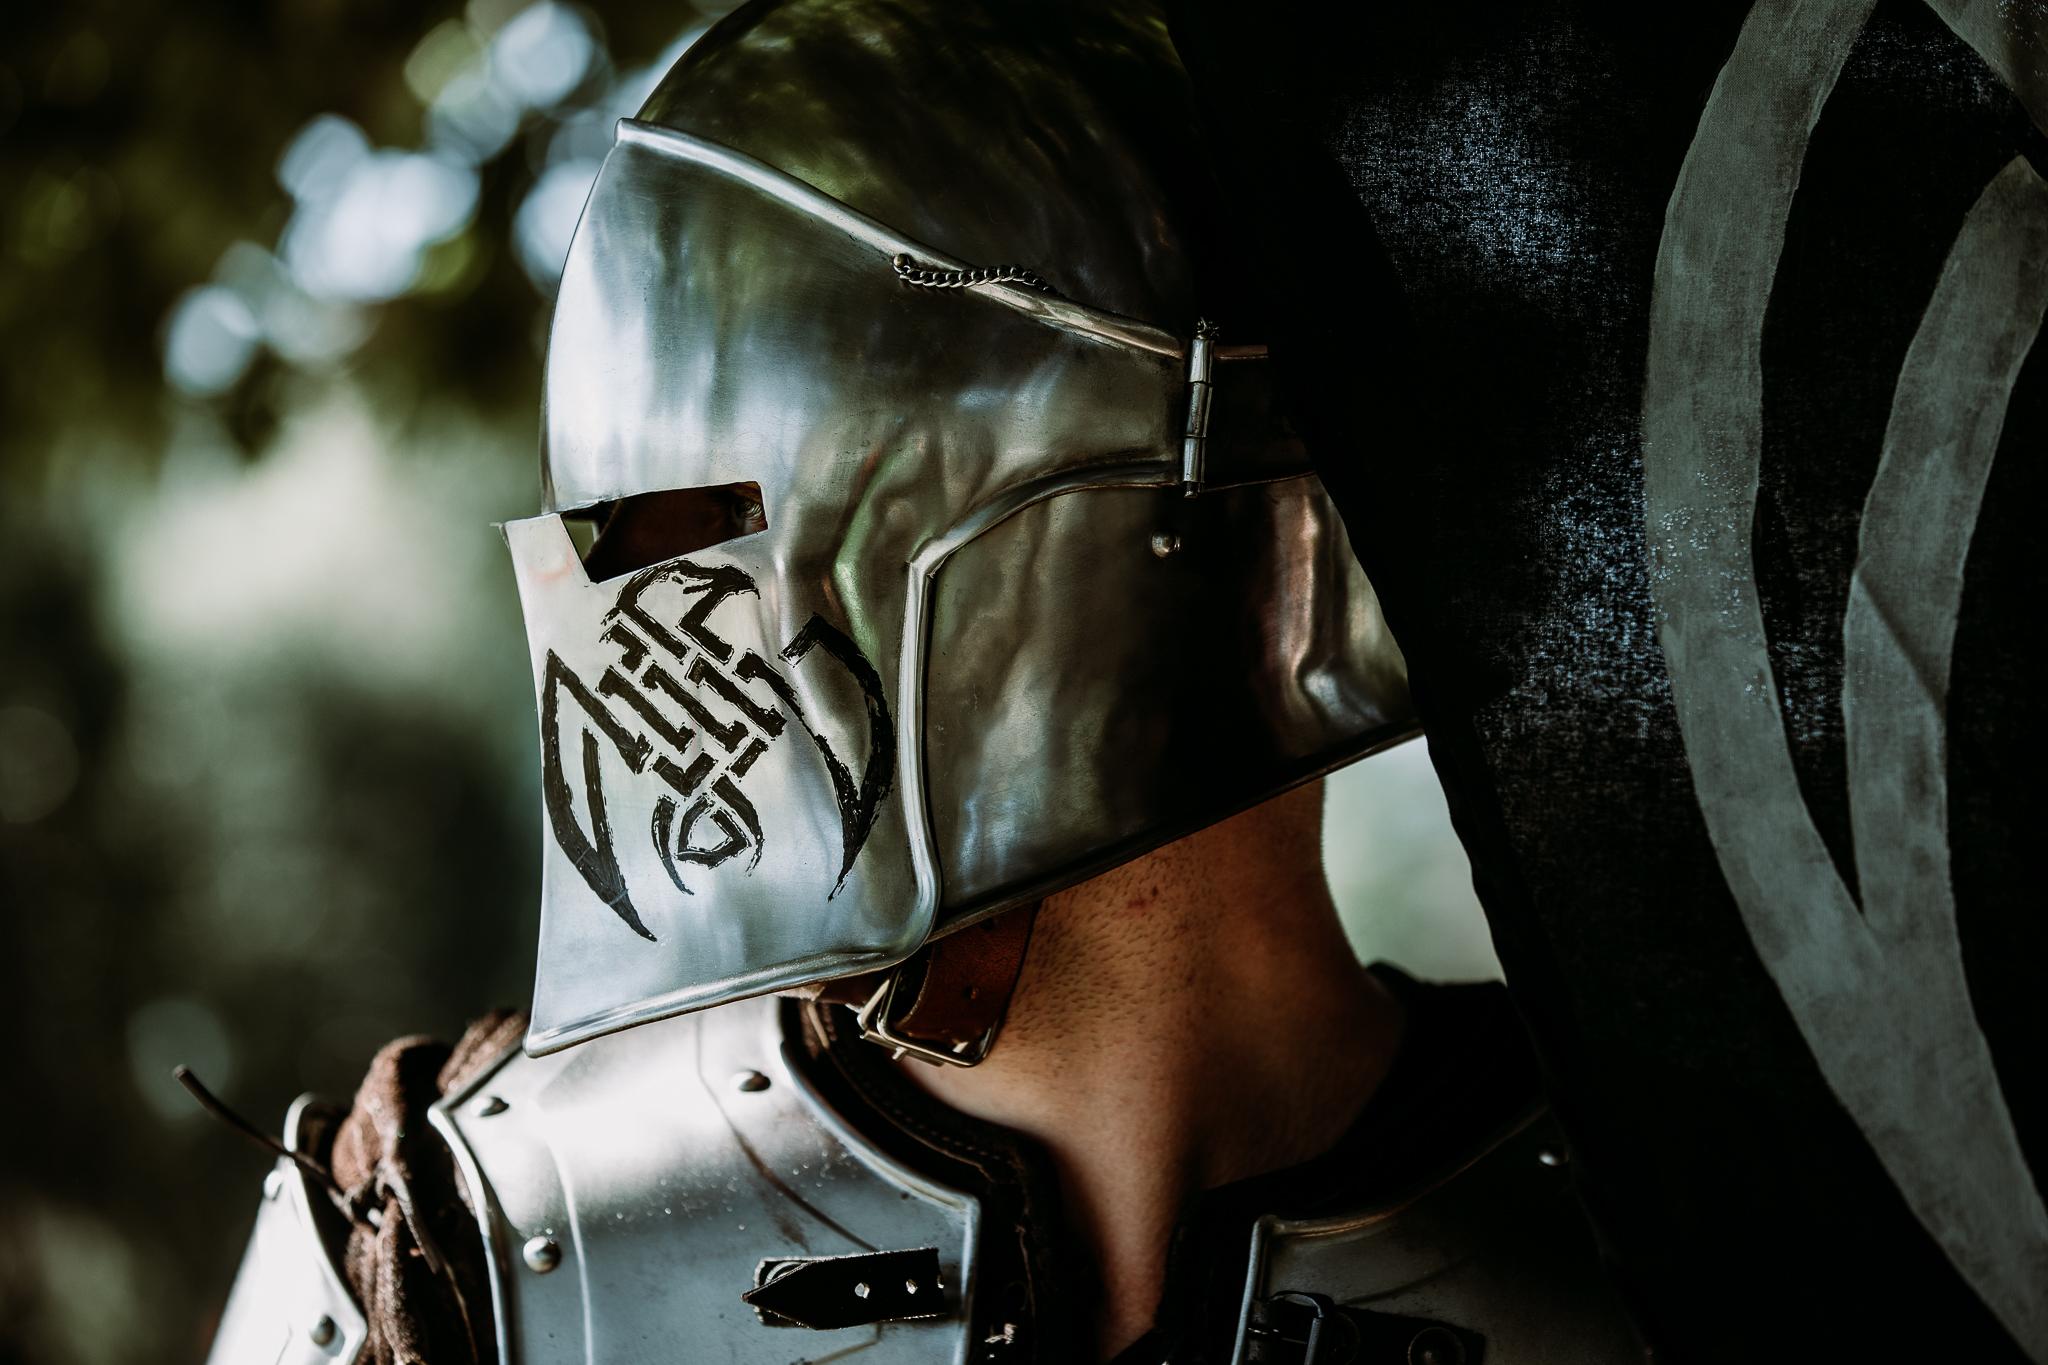 Swordcraft-1286_LR.jpg